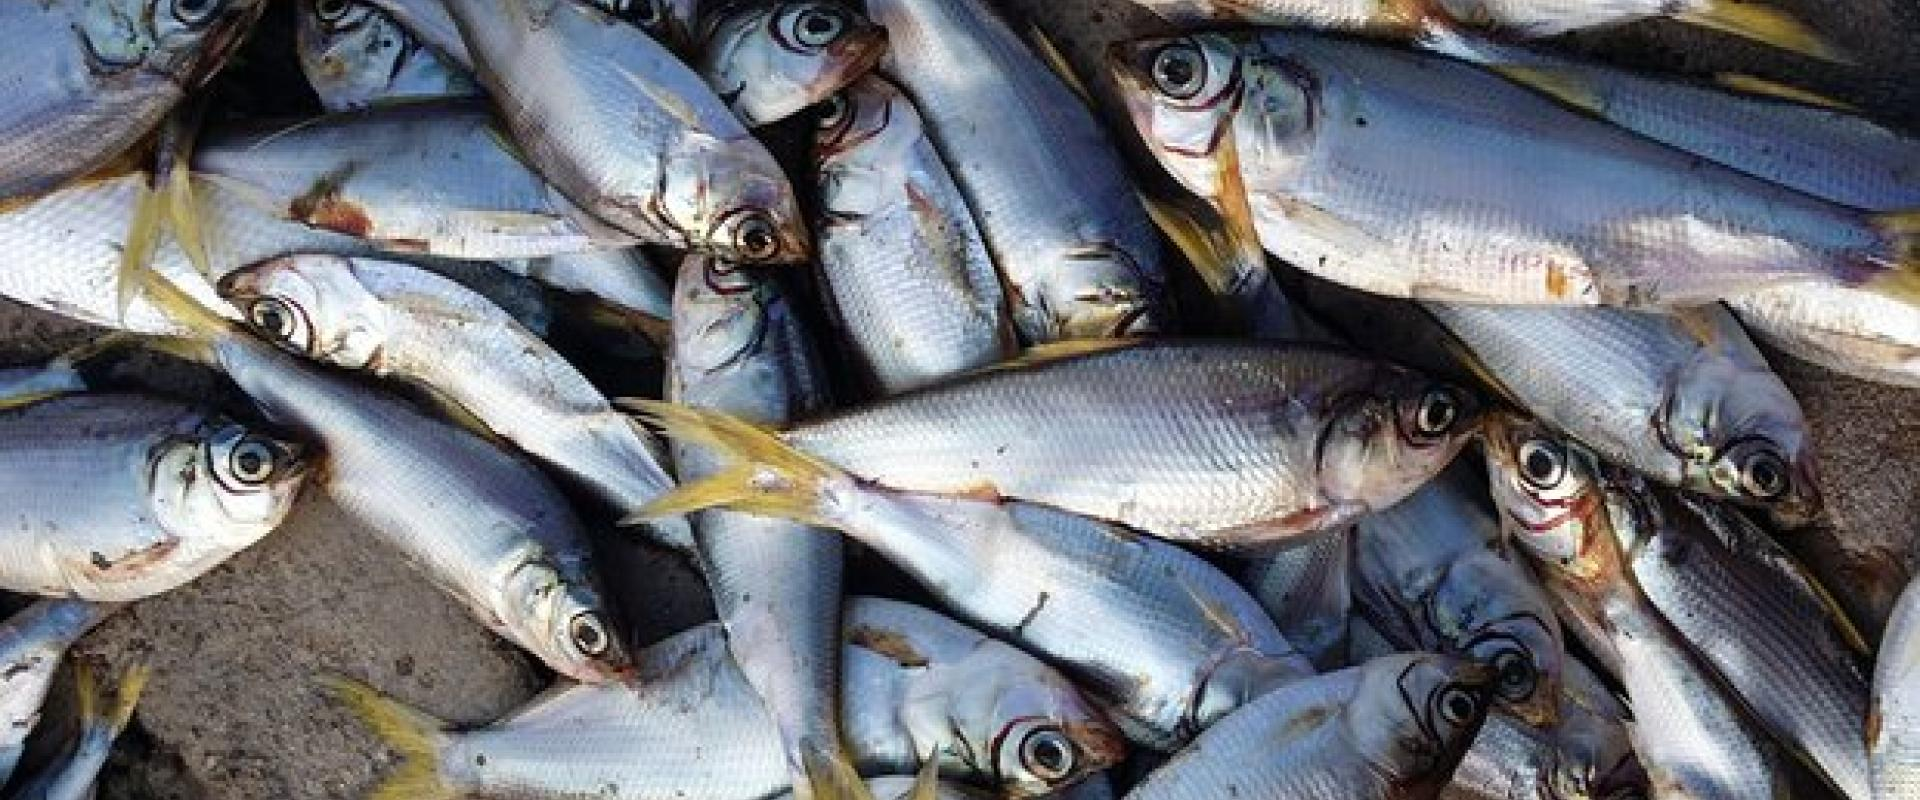 Fishing experience in Sardinia